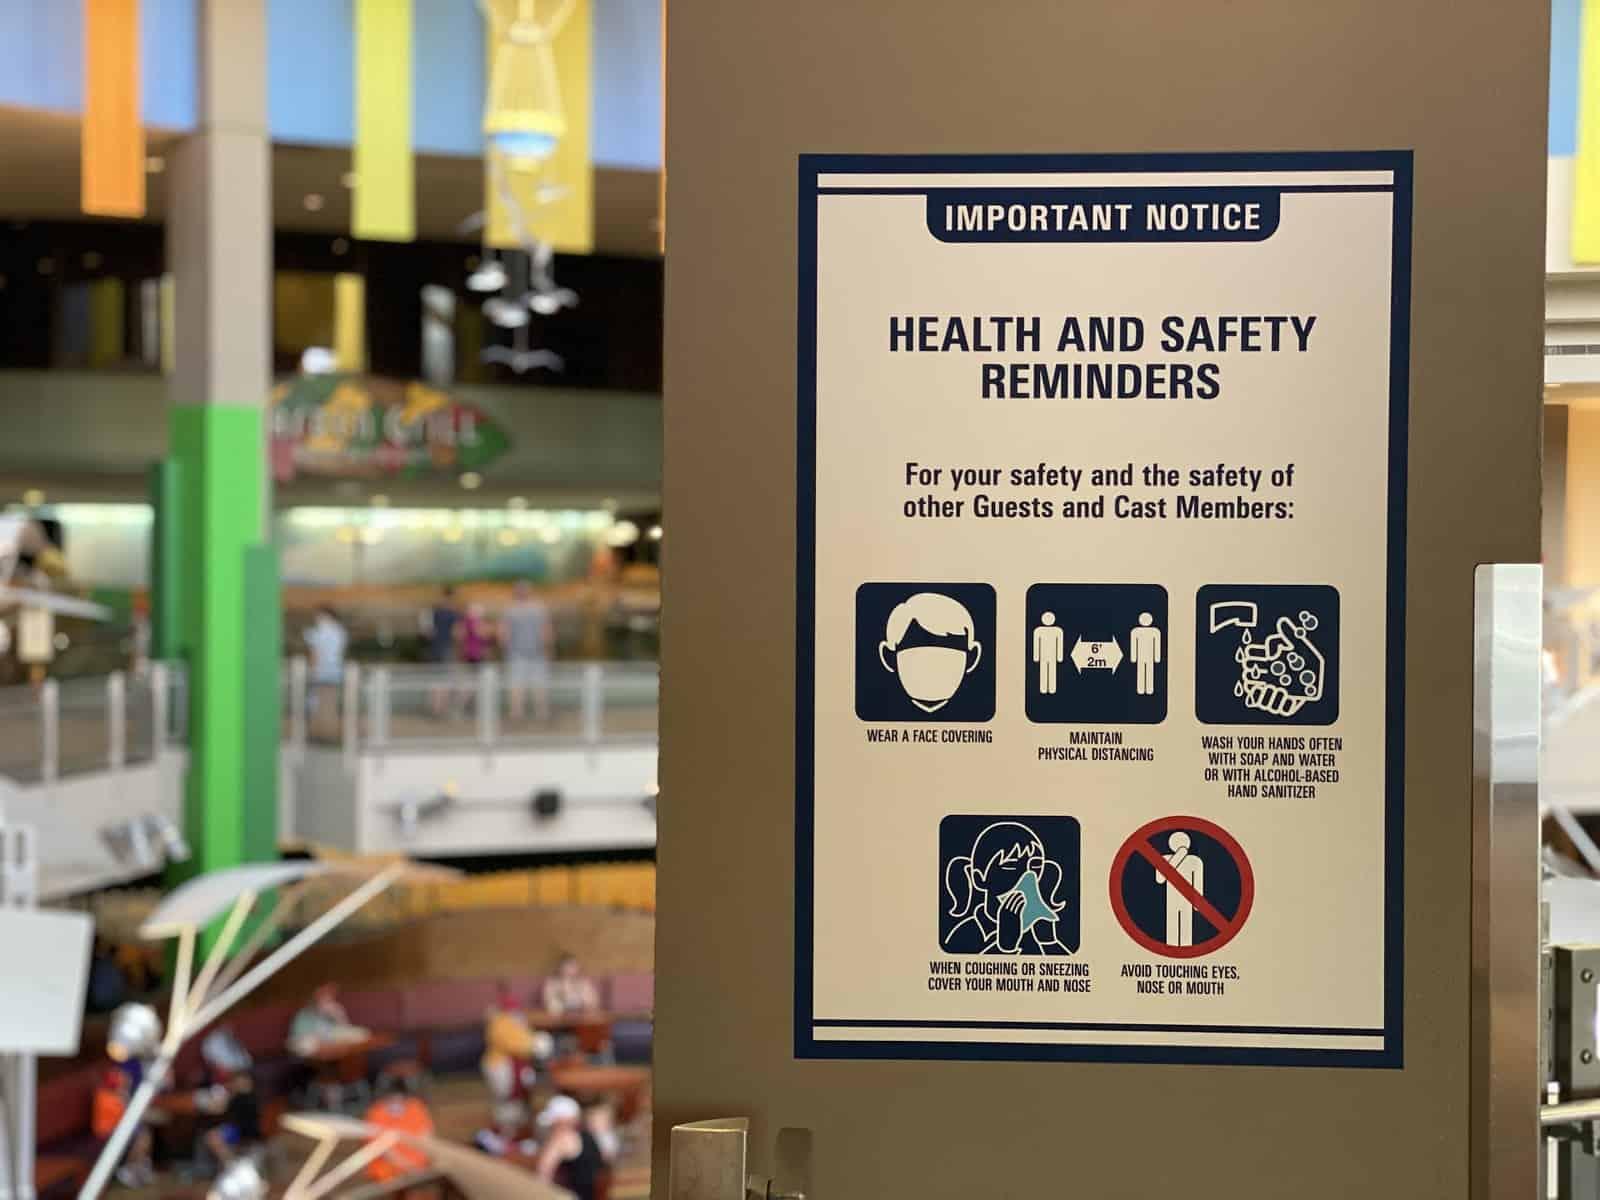 Walt Disney World health and safety reminders